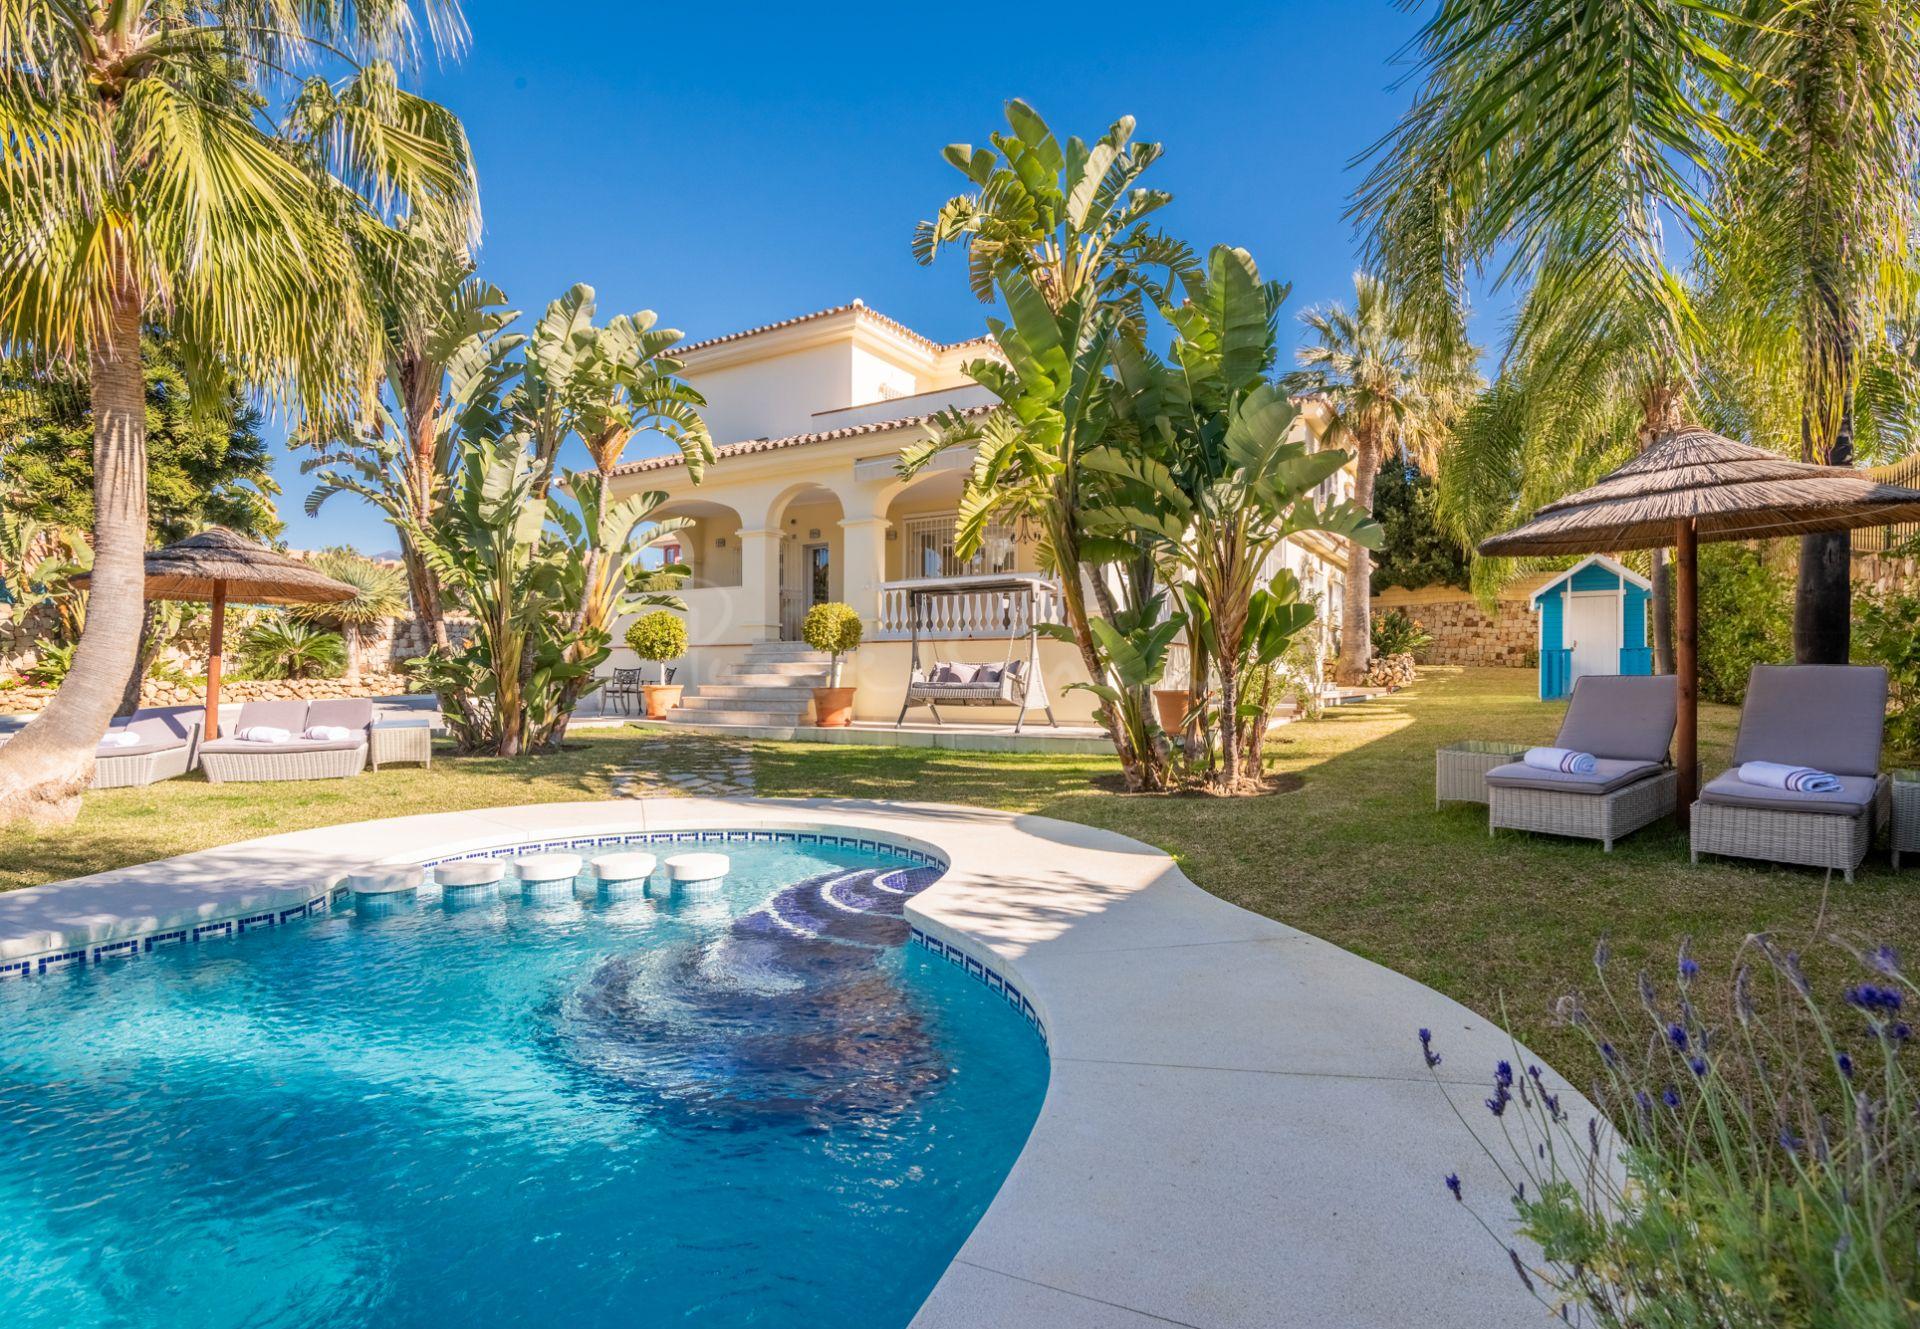 Villa in Bel Air, Estepona